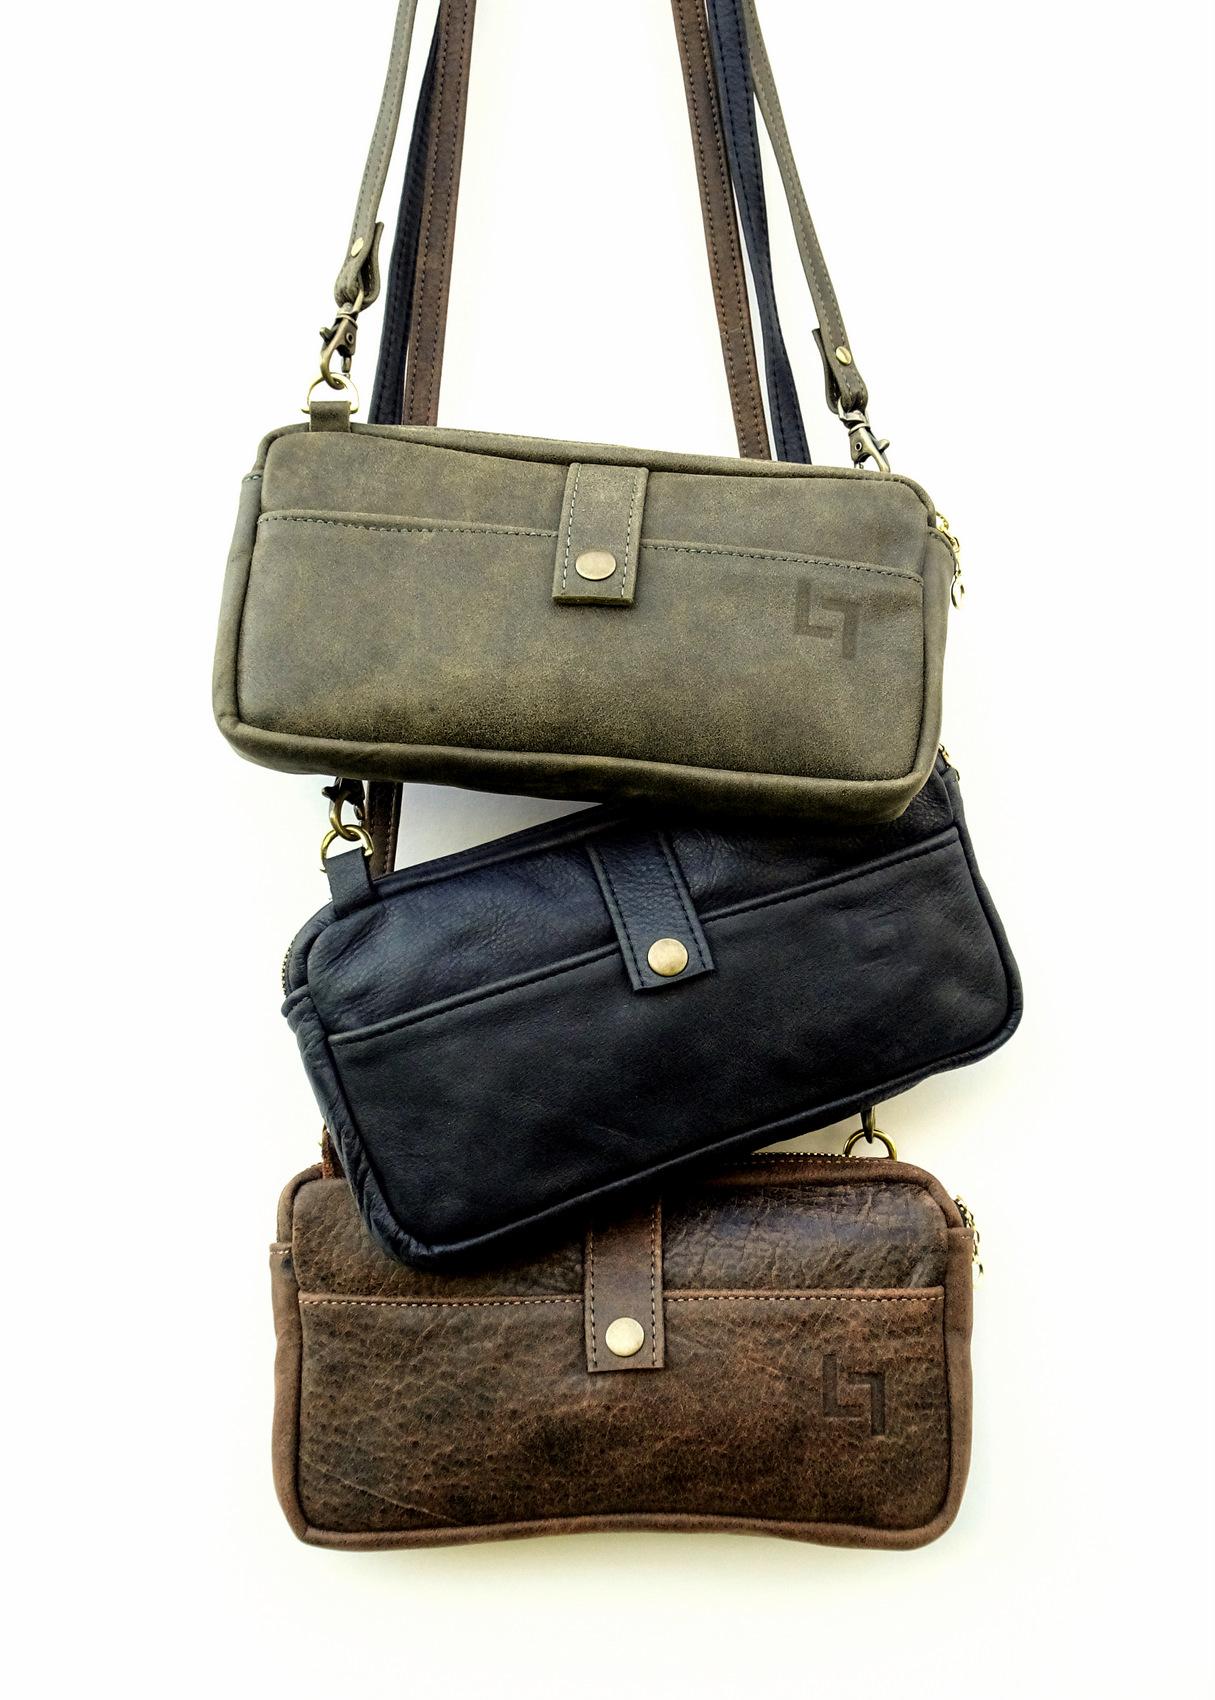 2-Handcrafted Leather Shoulder Bag, Burnin' Man, LaPlace Leather, Memphis -003.JPG